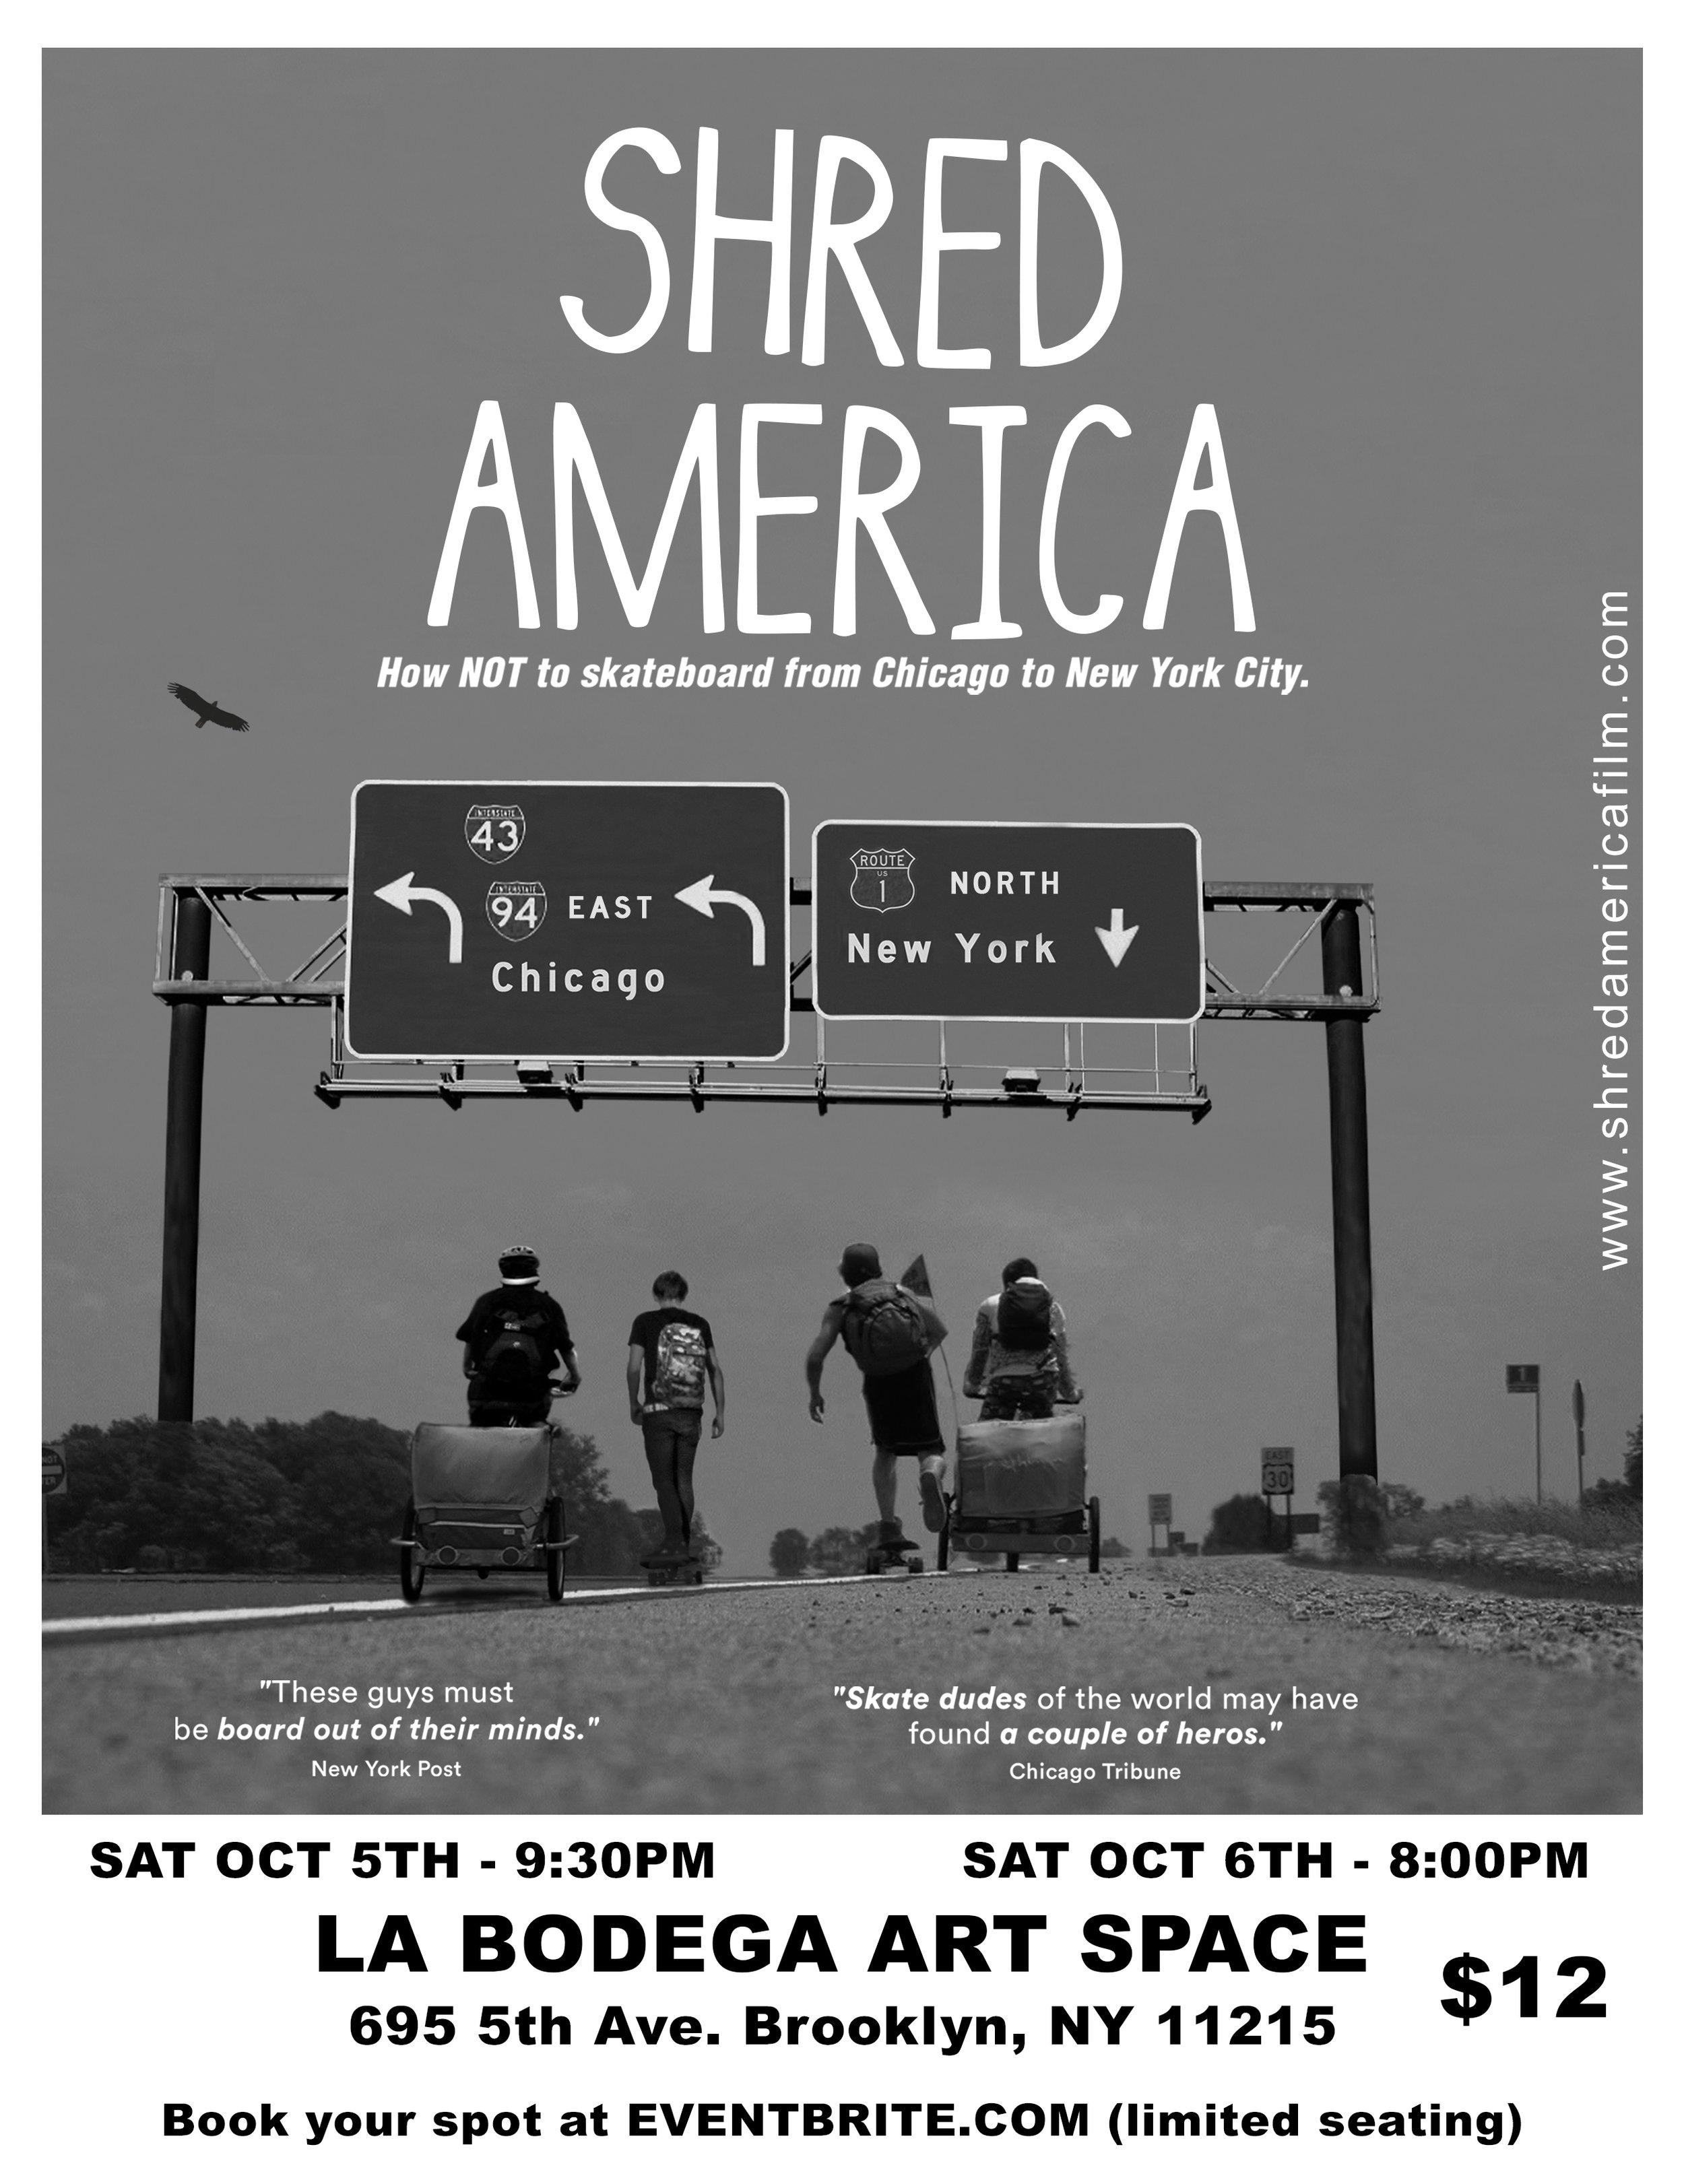 La Bodega Oct 5 and 6 photoshop full size poster v2.jpg